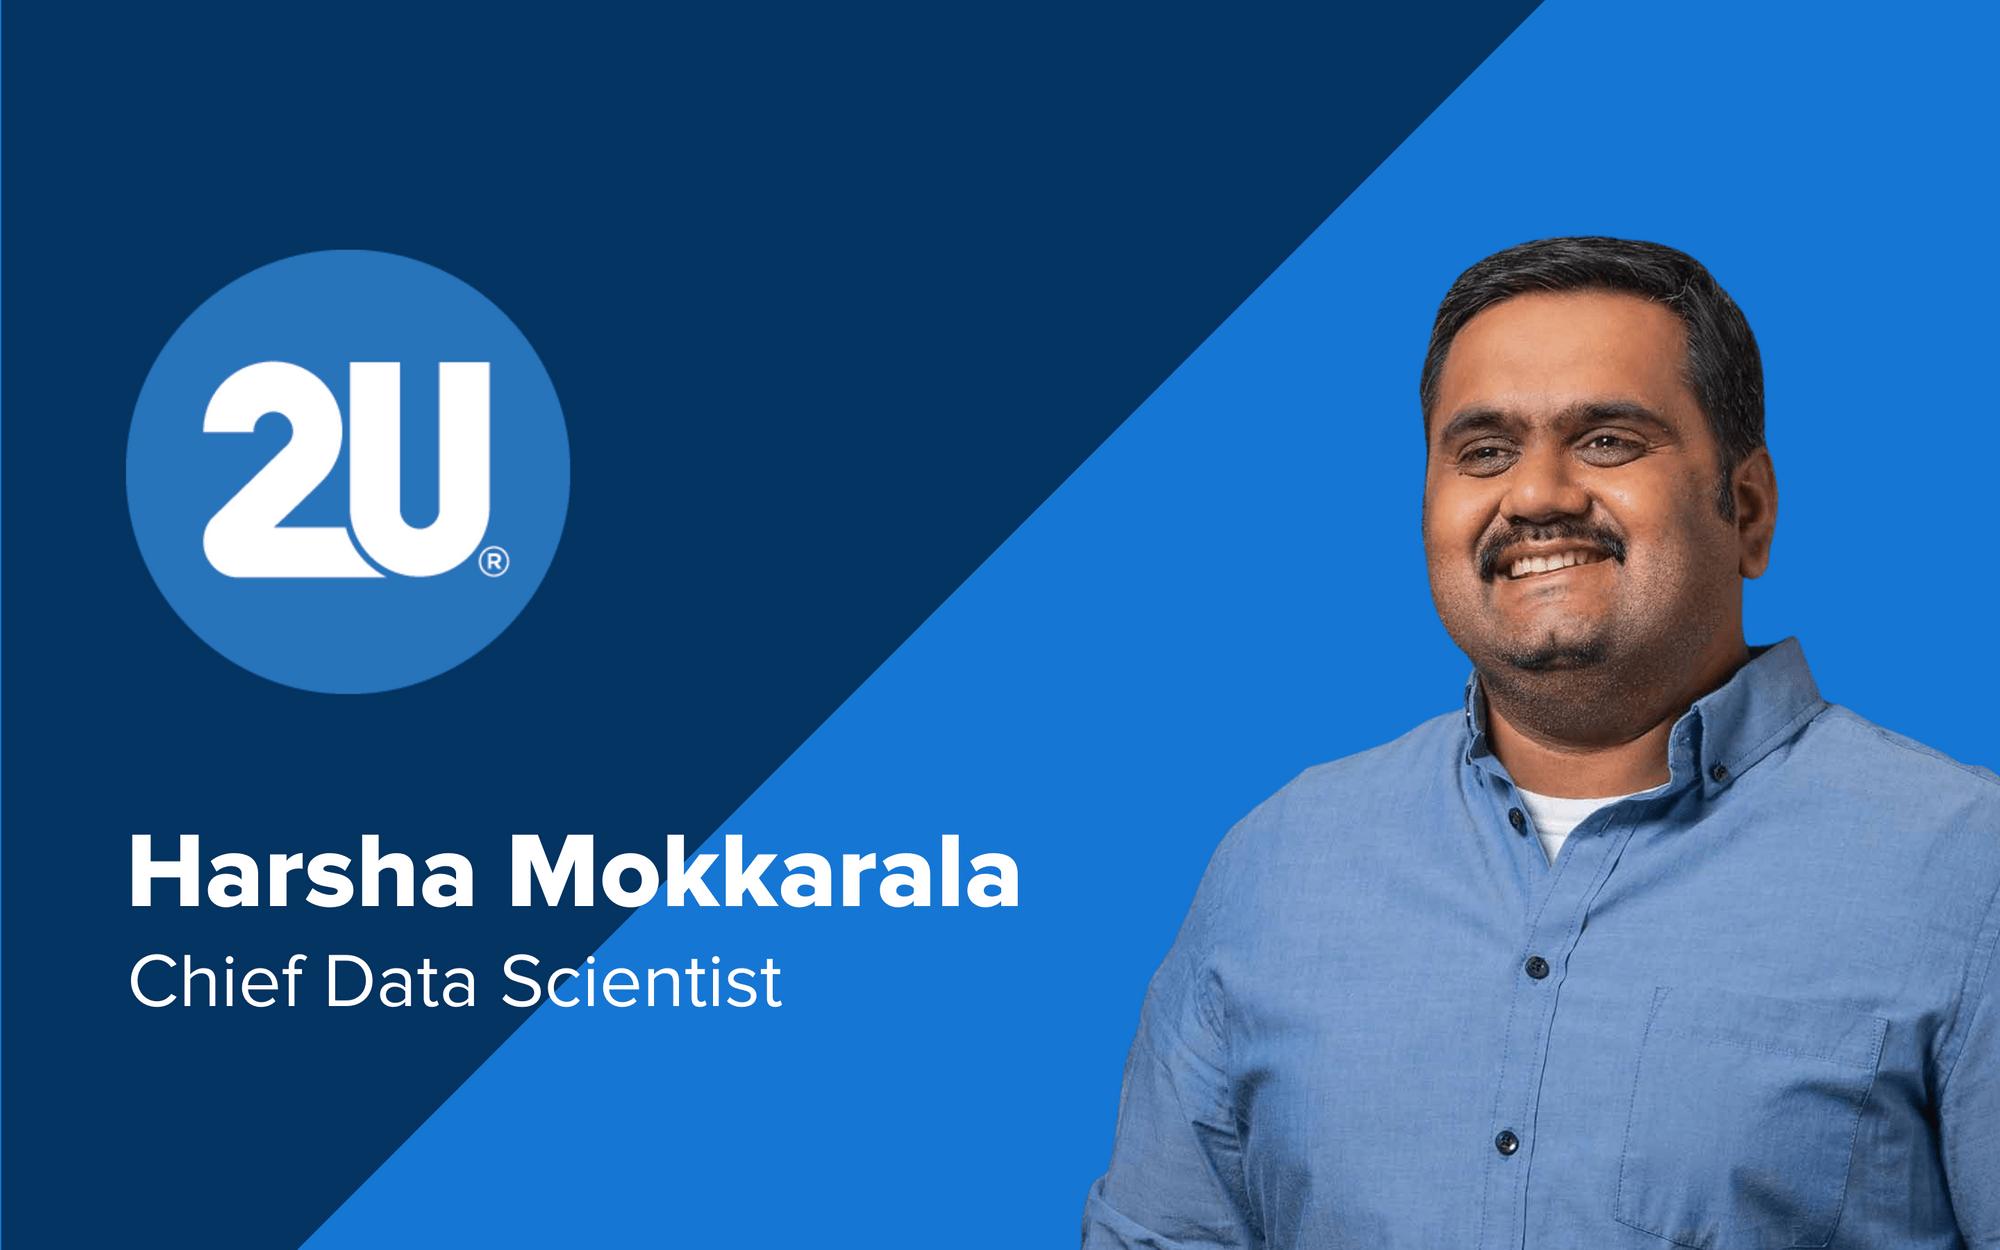 Harsha Mokkarala, Chief Data Scientist